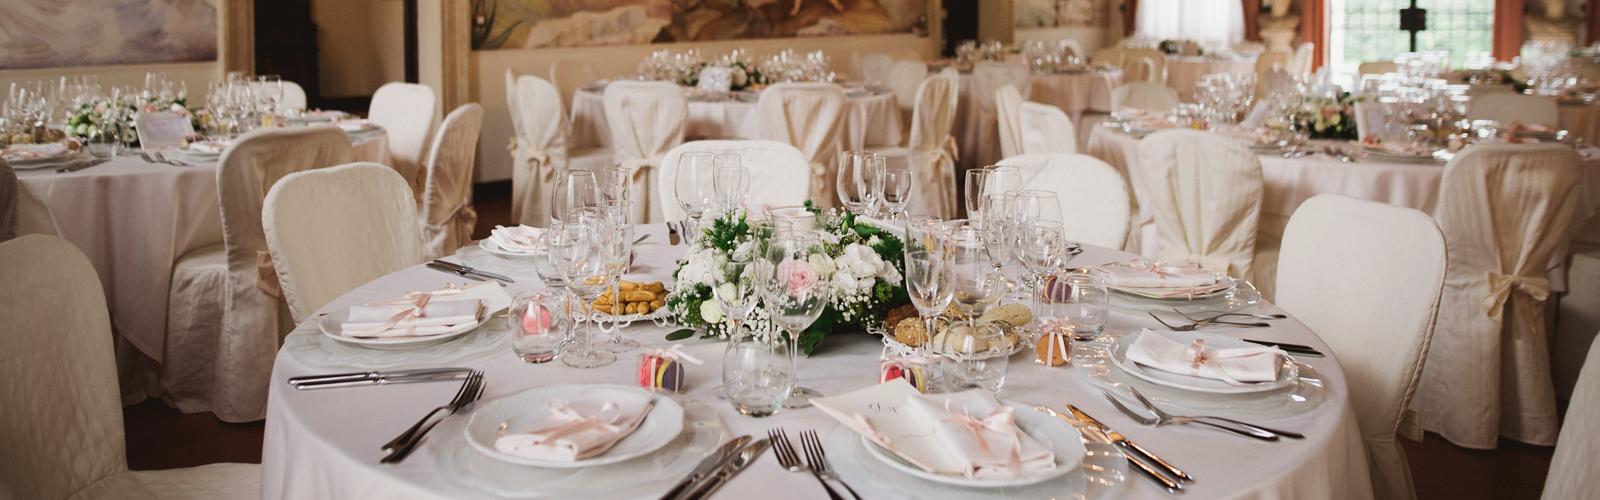 allestimento banchetto matrimonio, sala da pranzo matrimonio, sala da pranzo con affreschi